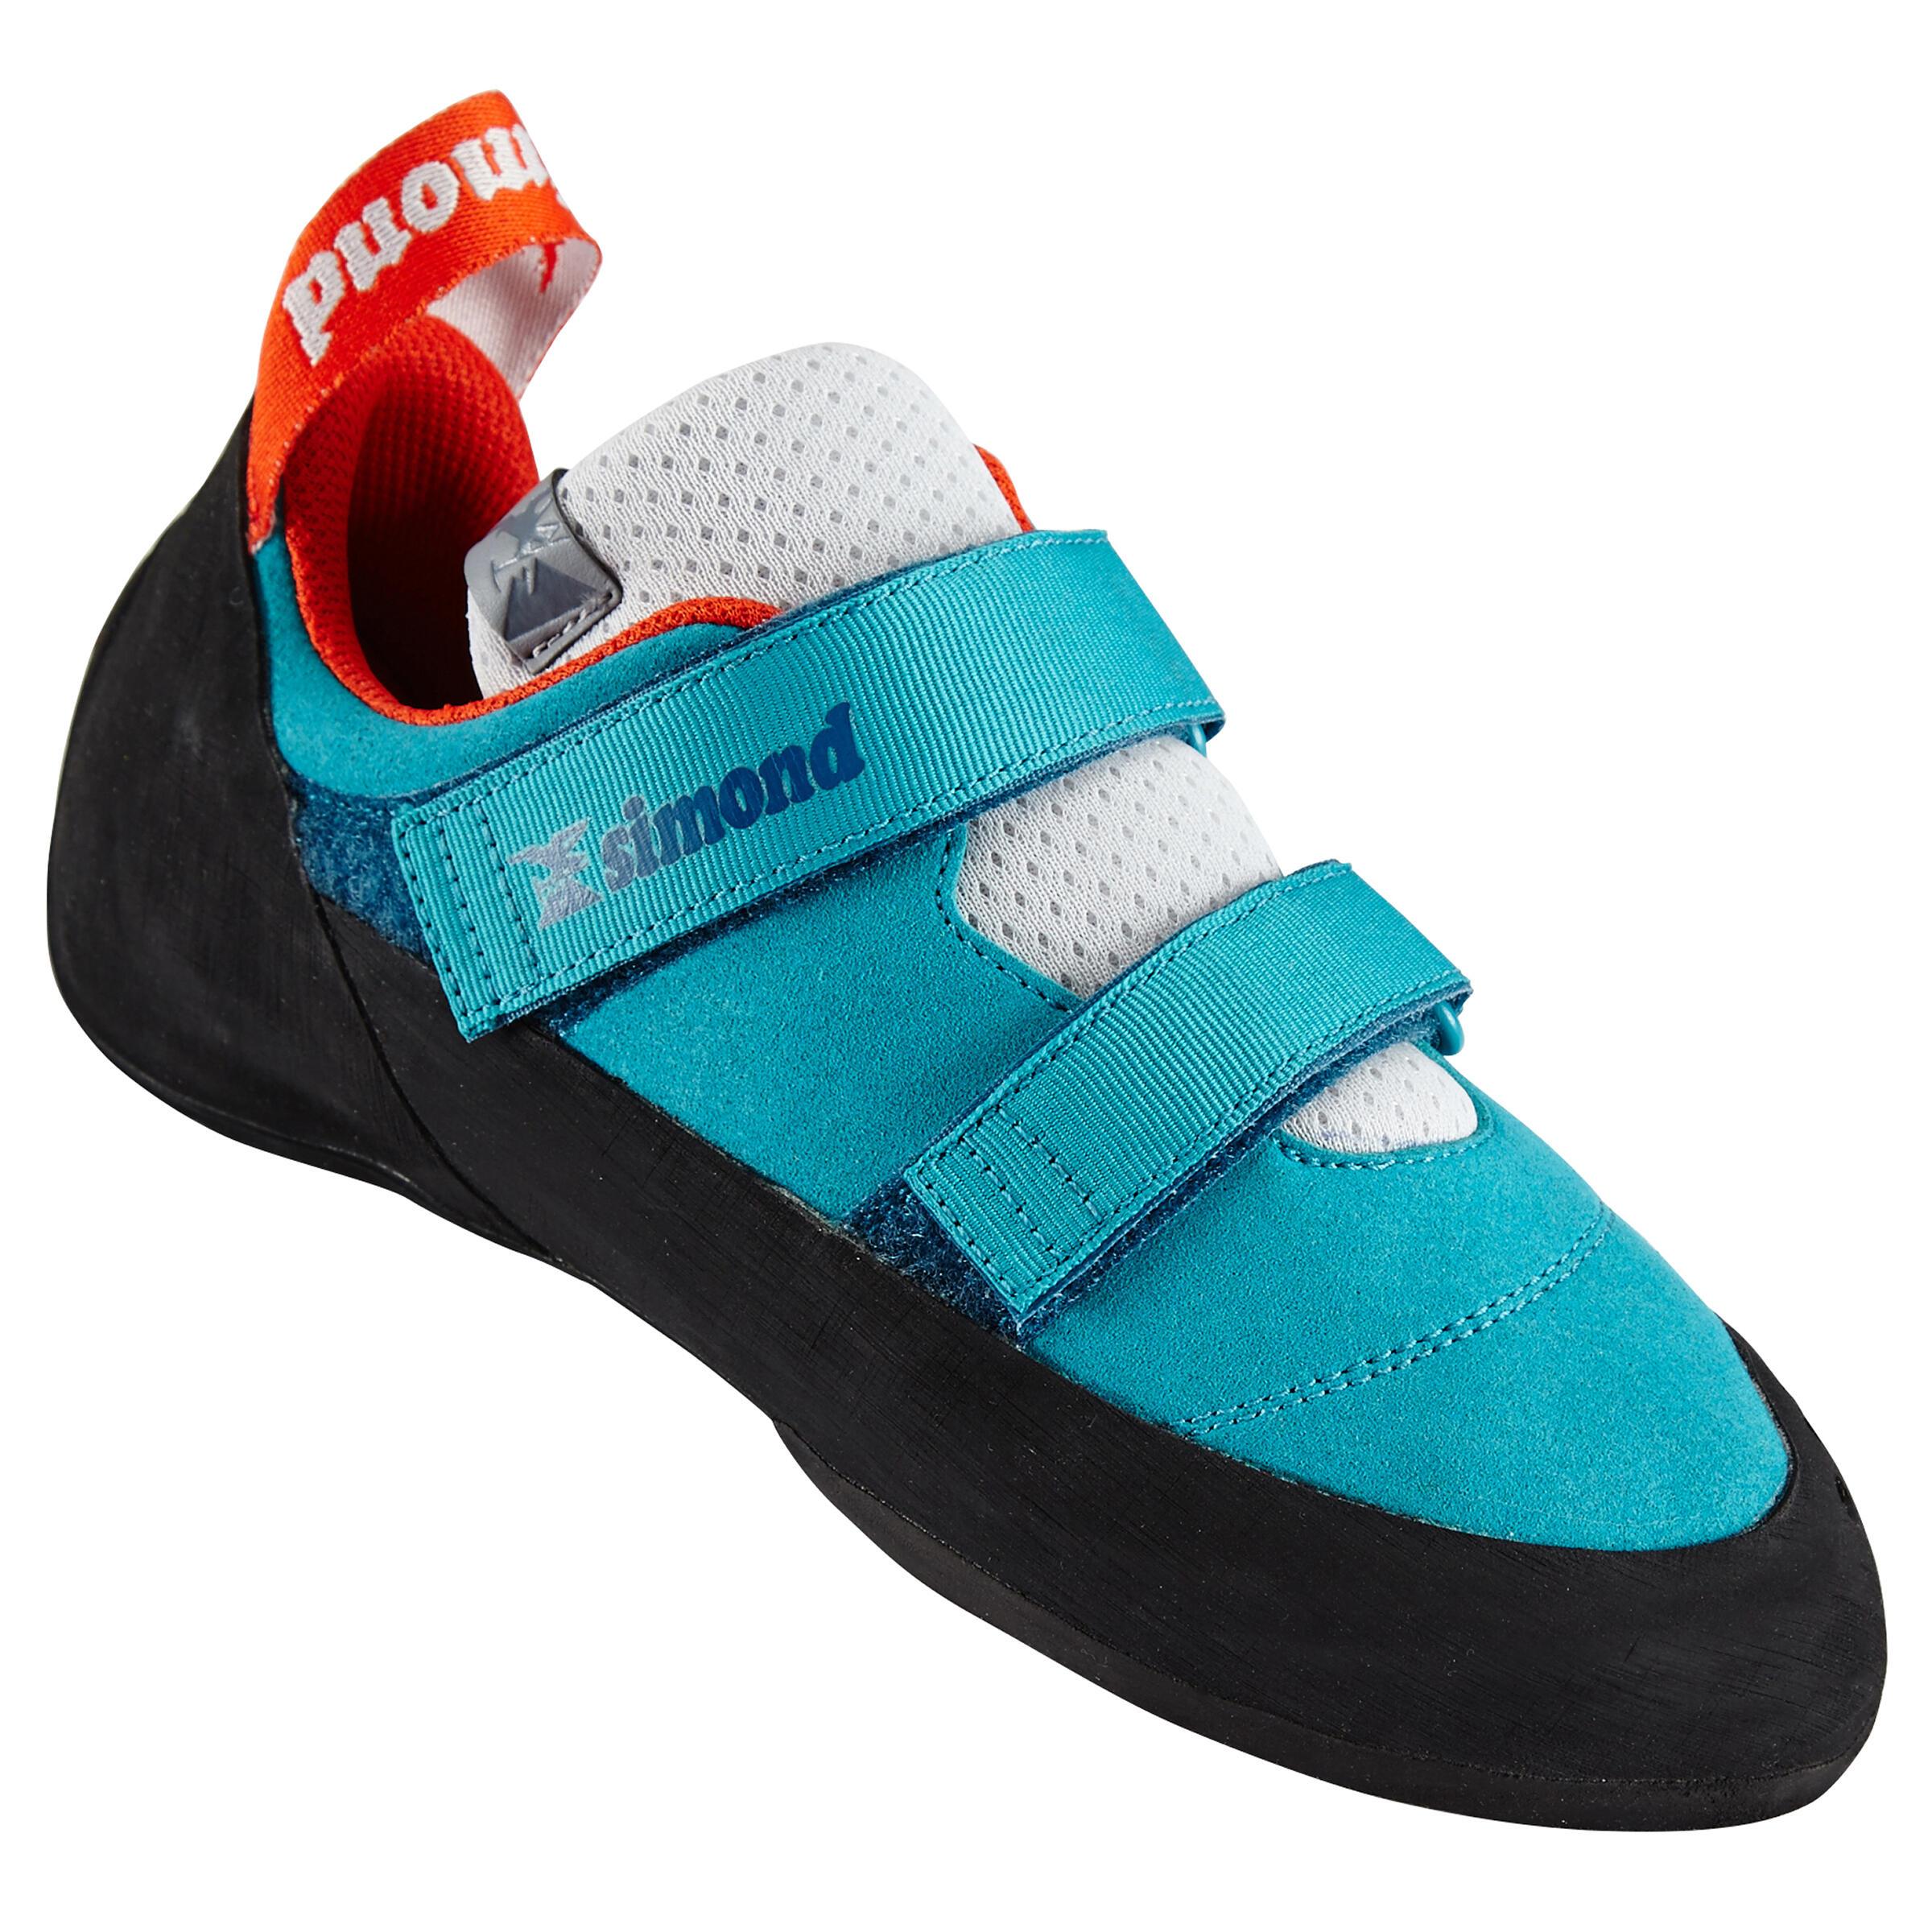 Kletterschuhe Rock+ Erwachsene türkis | Schuhe > Outdoorschuhe > Kletterschuhe | Blau - Türkis - Grau | Simond